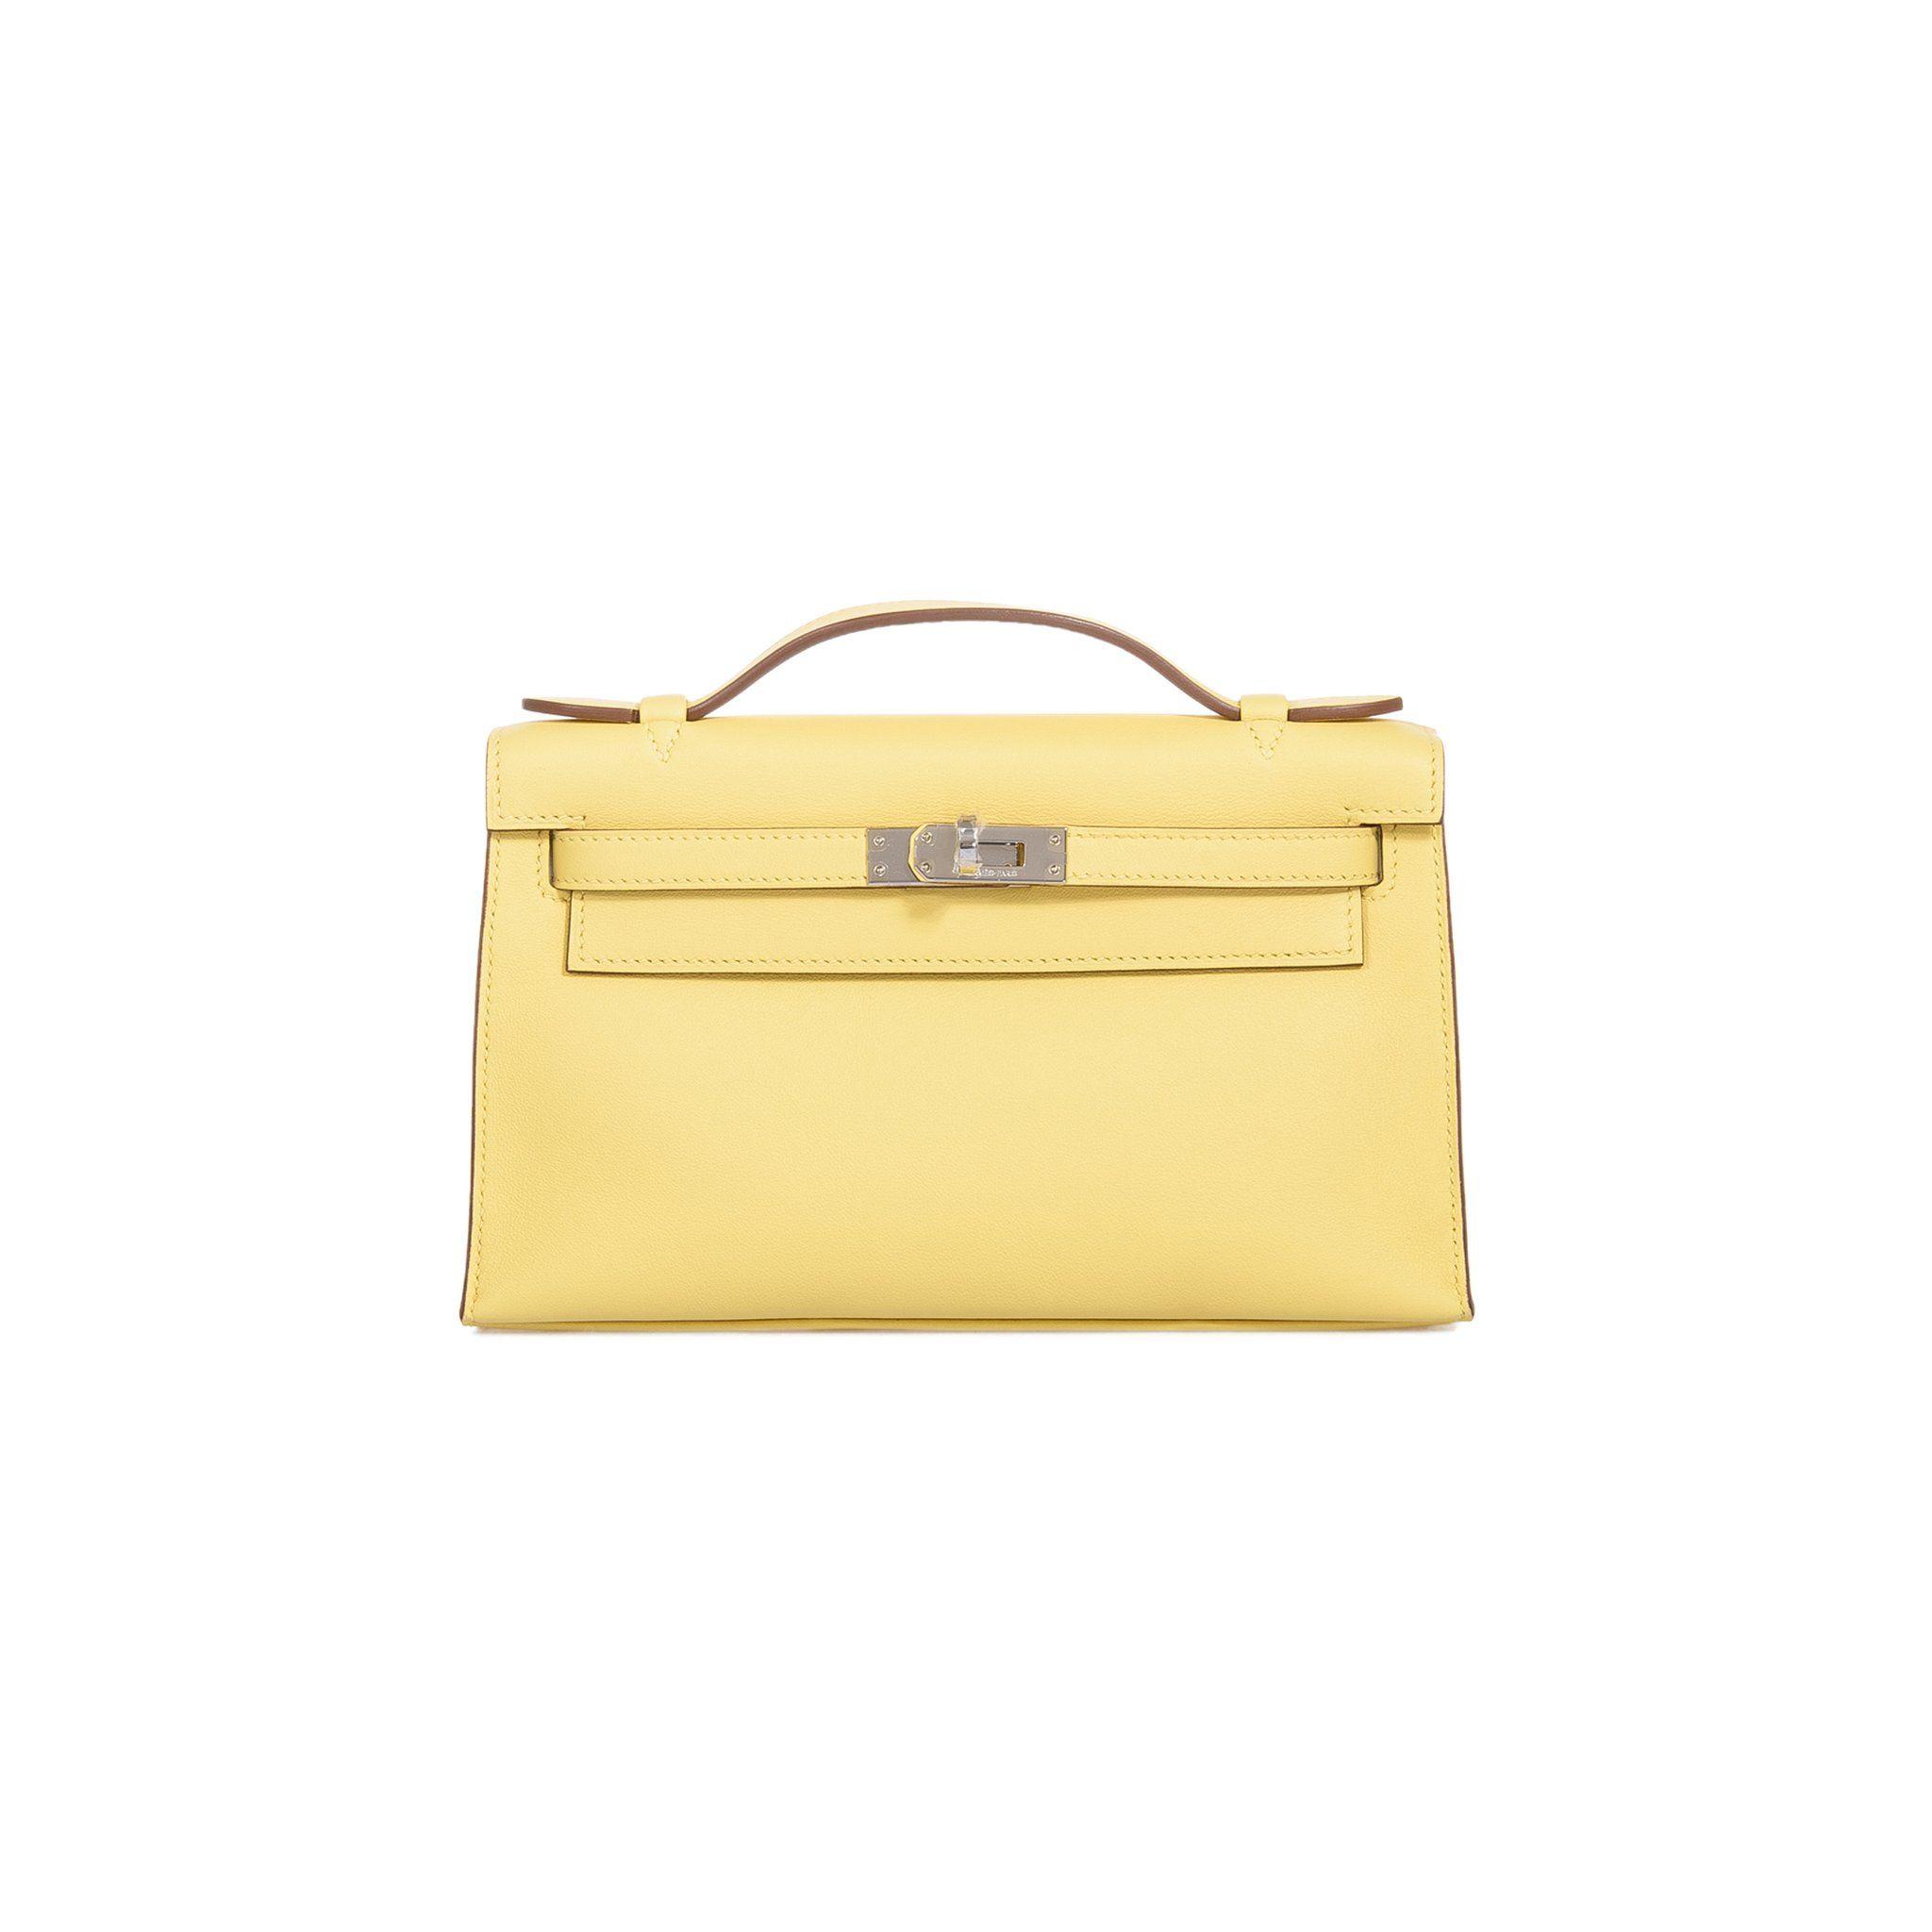 402cec7938 Hermes Mini  Kelly Pochette Etoupe Swift Gold Hardware  Clutch  Bag ...